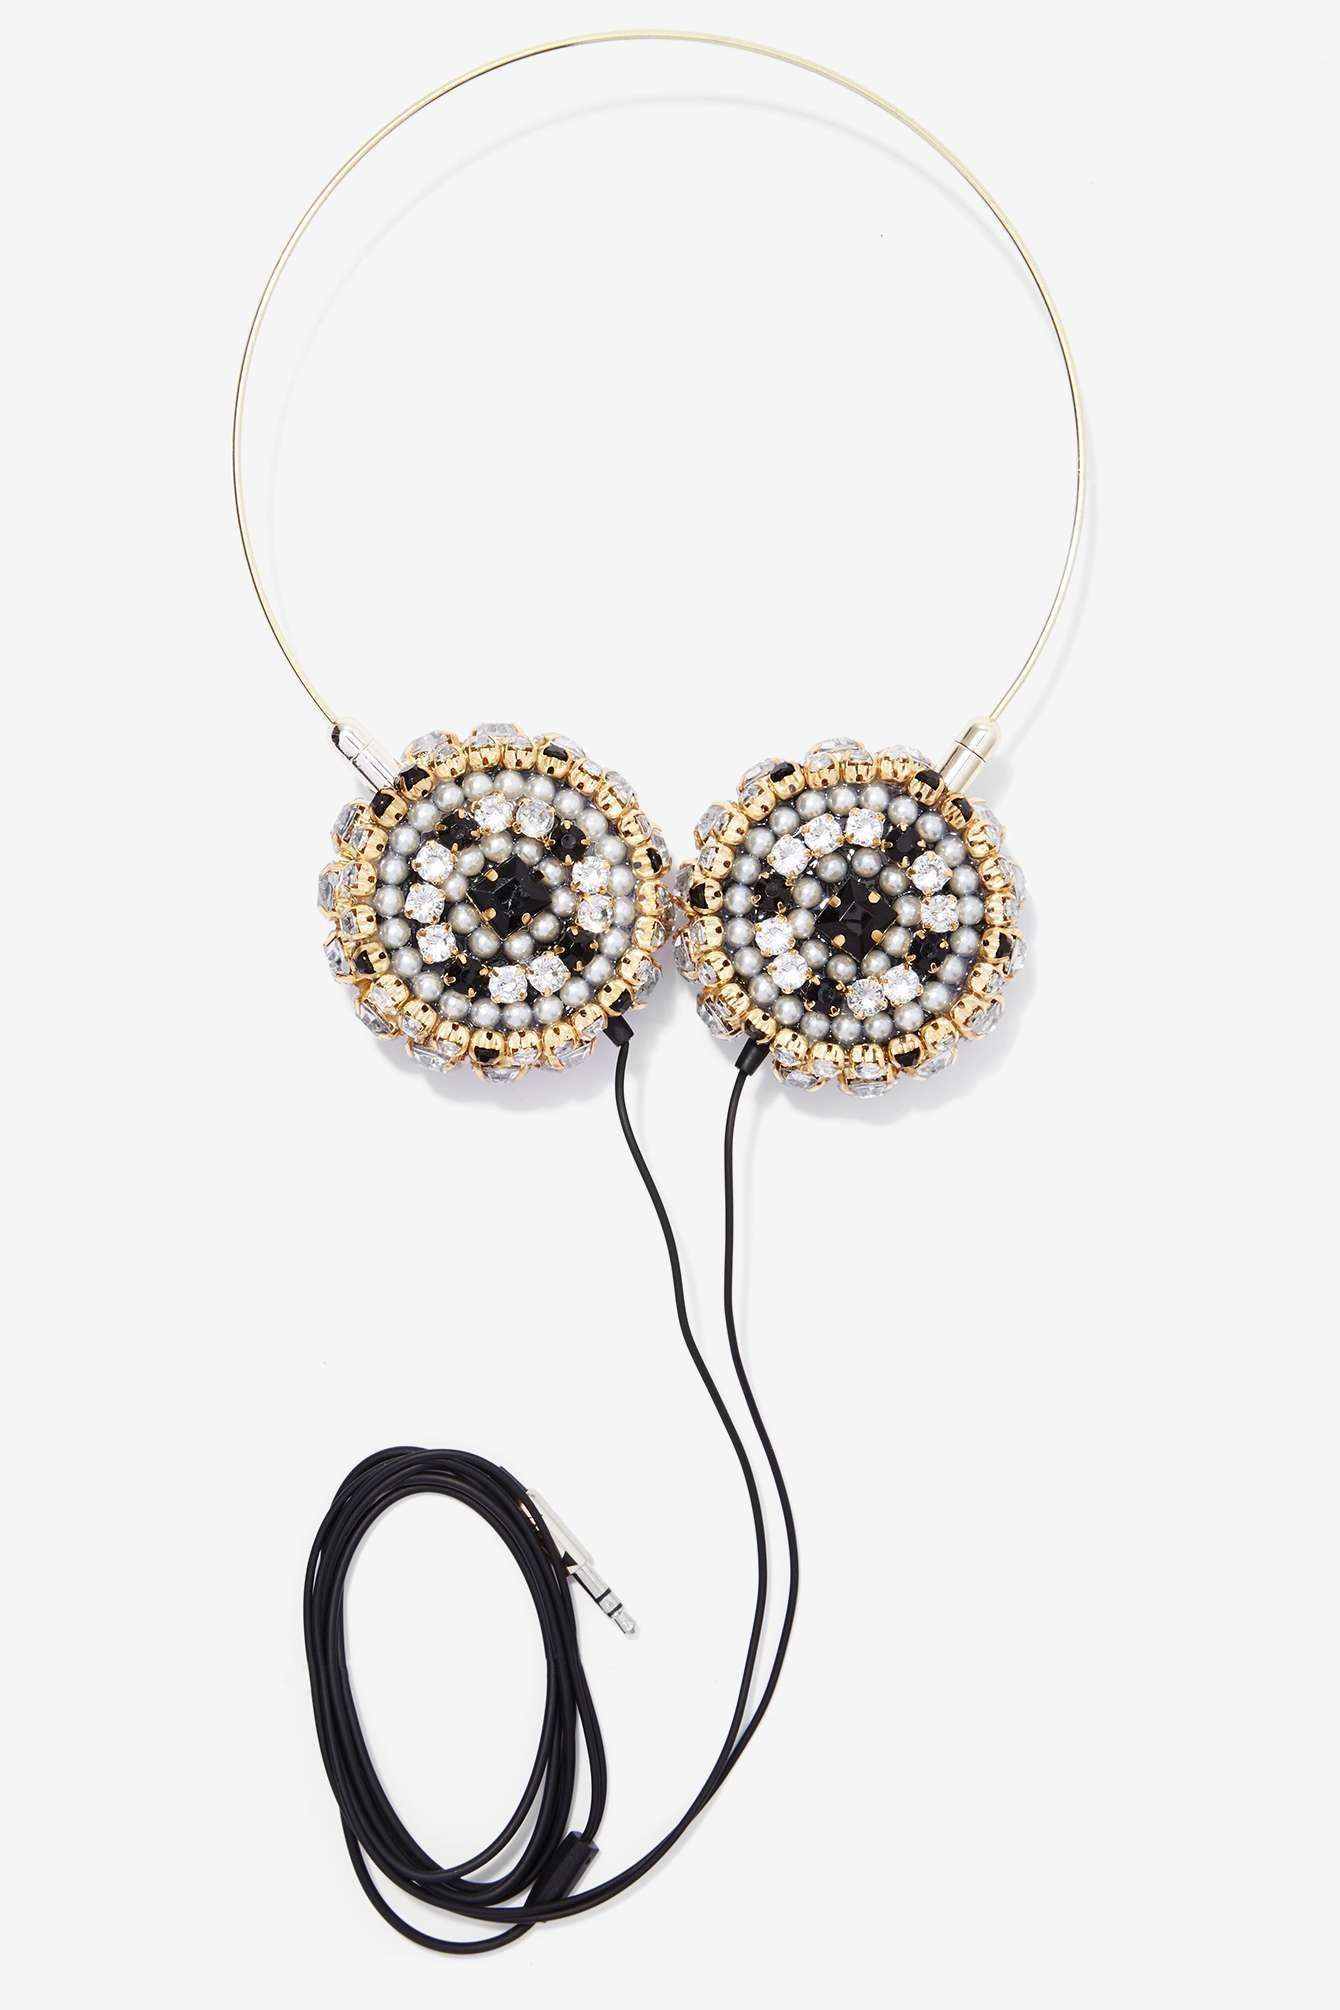 Nasty-Gal-Skinnydip London-Zara -Martin- Bling-Headphones-3